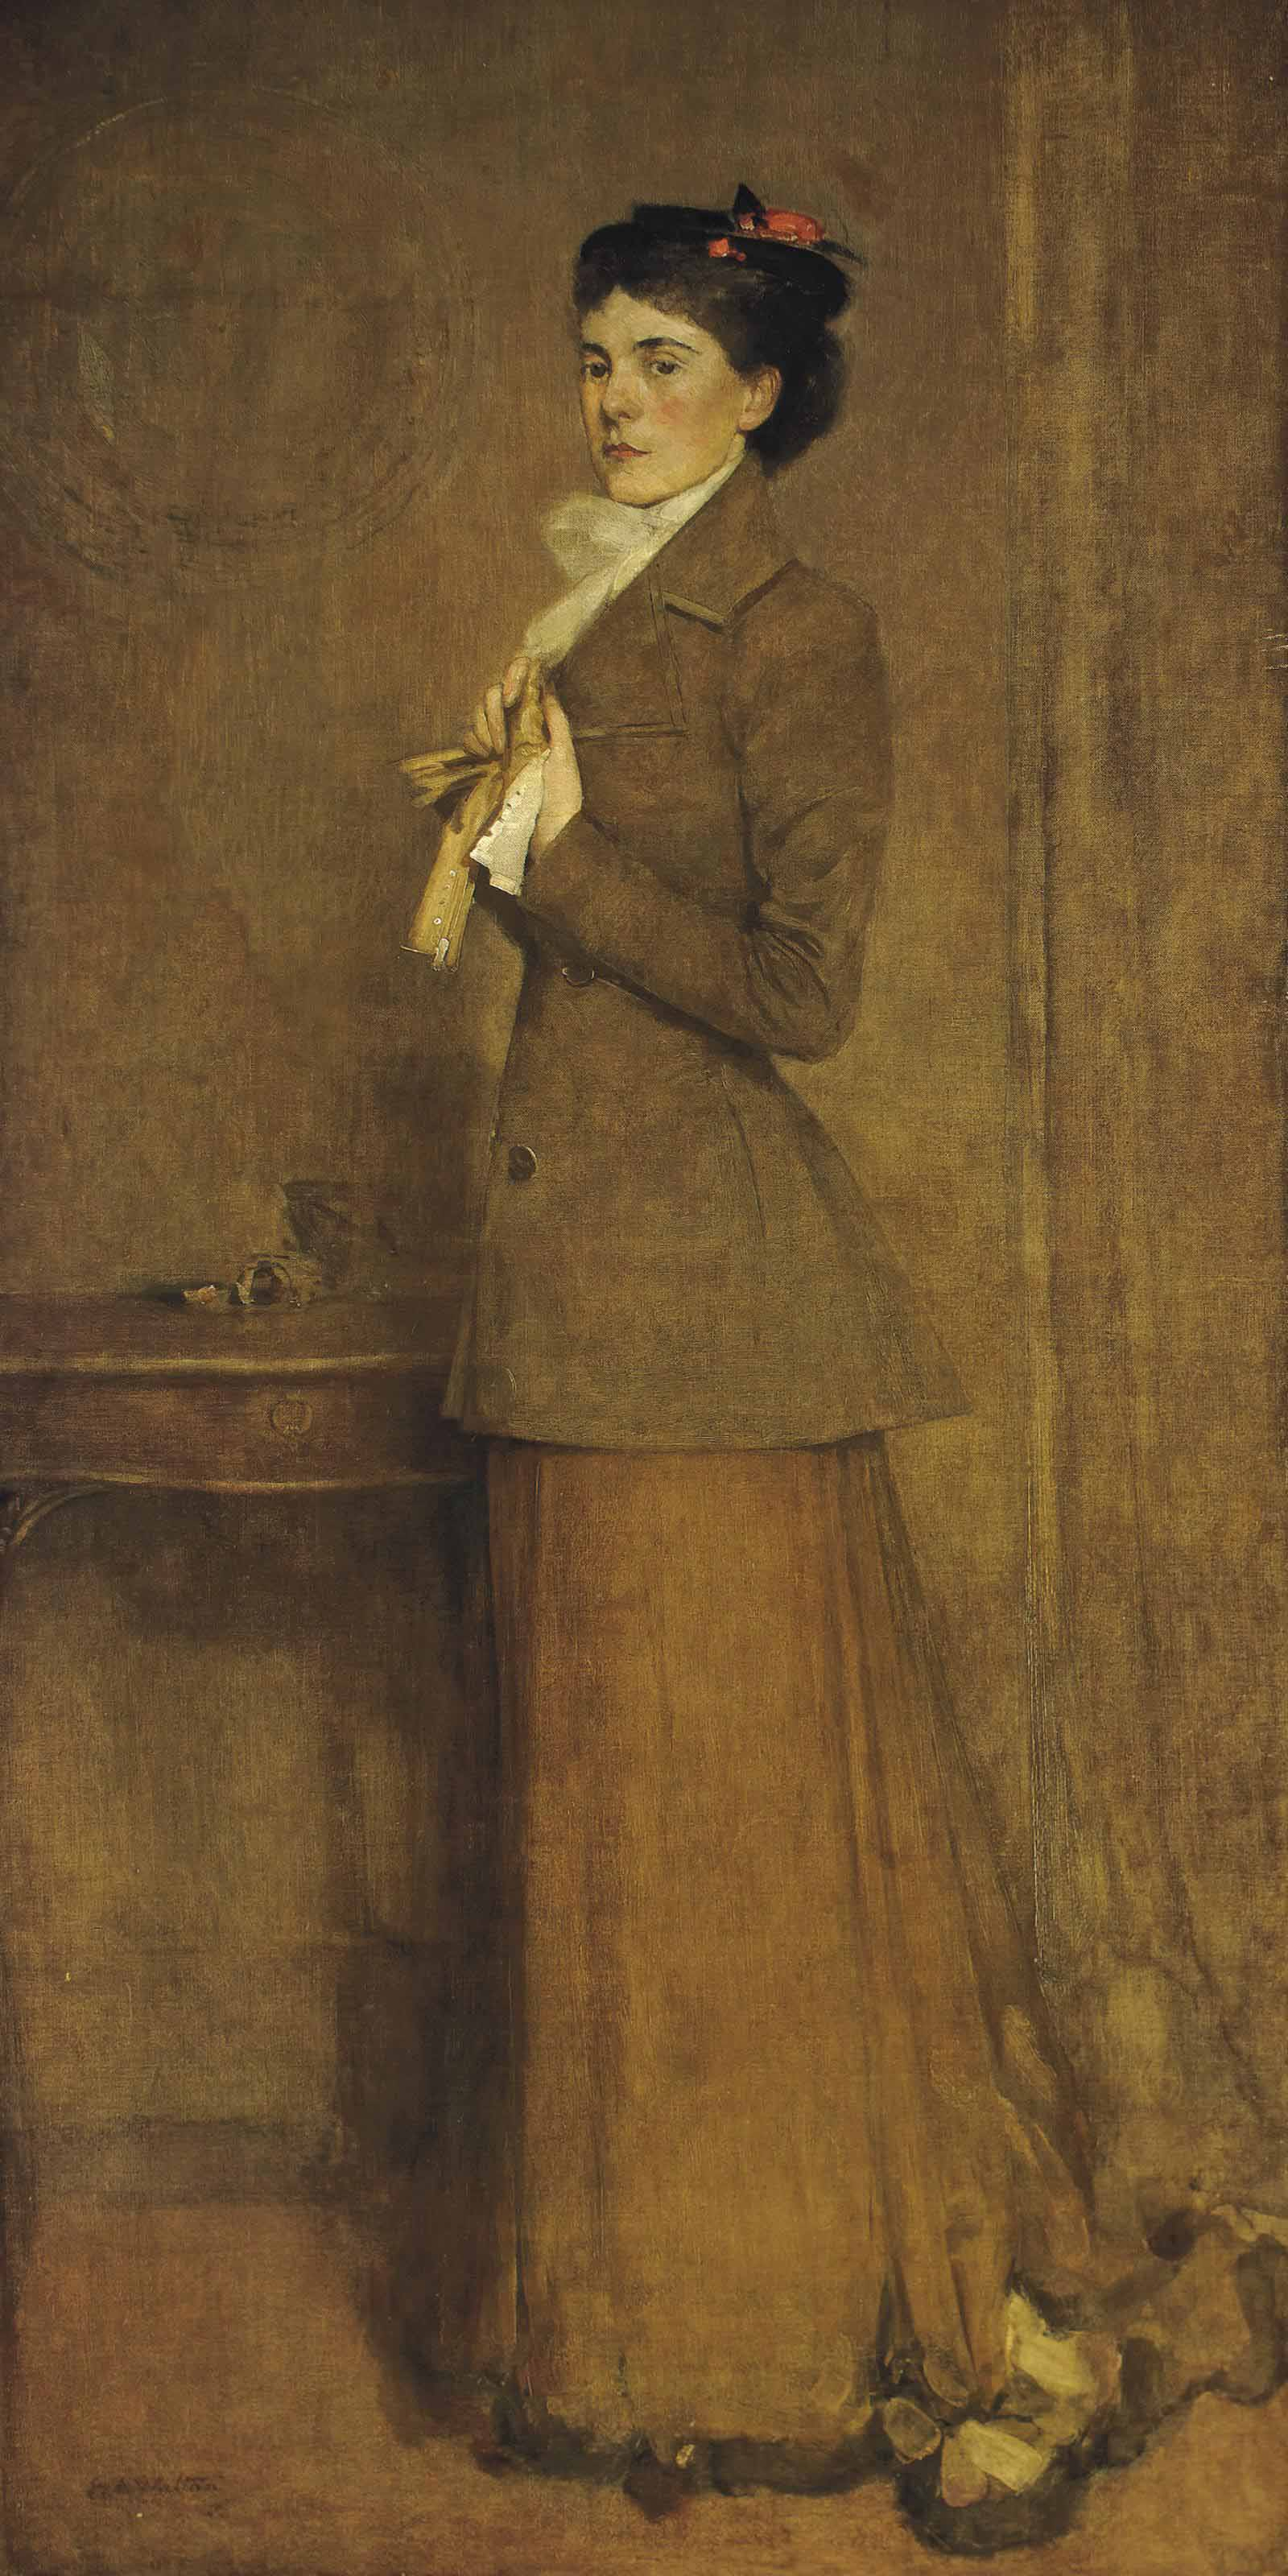 Miss Jane Aitken